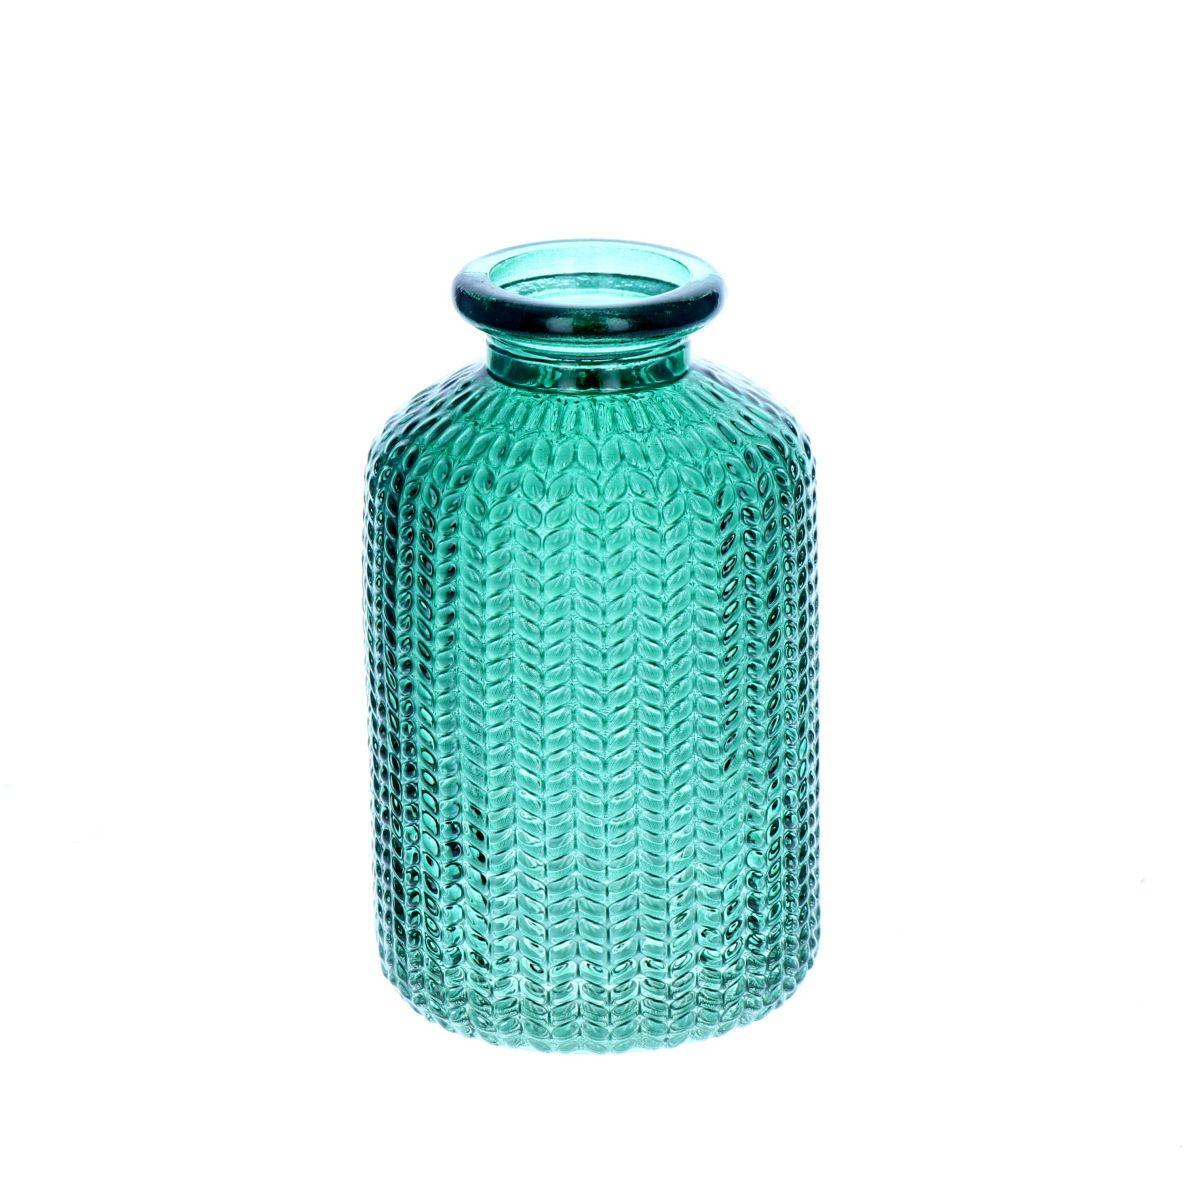 petit-vase-en-verre